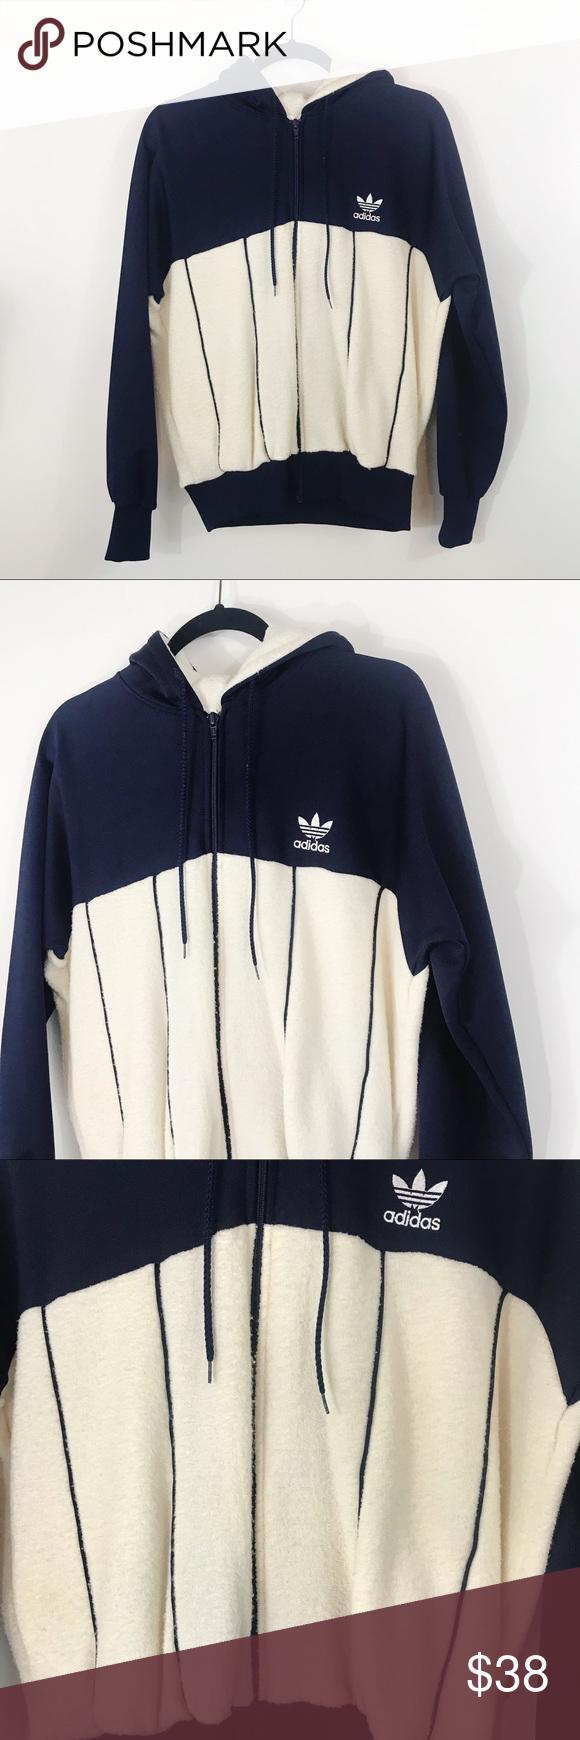 Adidas Vintage Fleece Zip Up Hoodie Jacket Large Vintage Adidas Hoodie Jacket Clothes Design [ 1740 x 580 Pixel ]